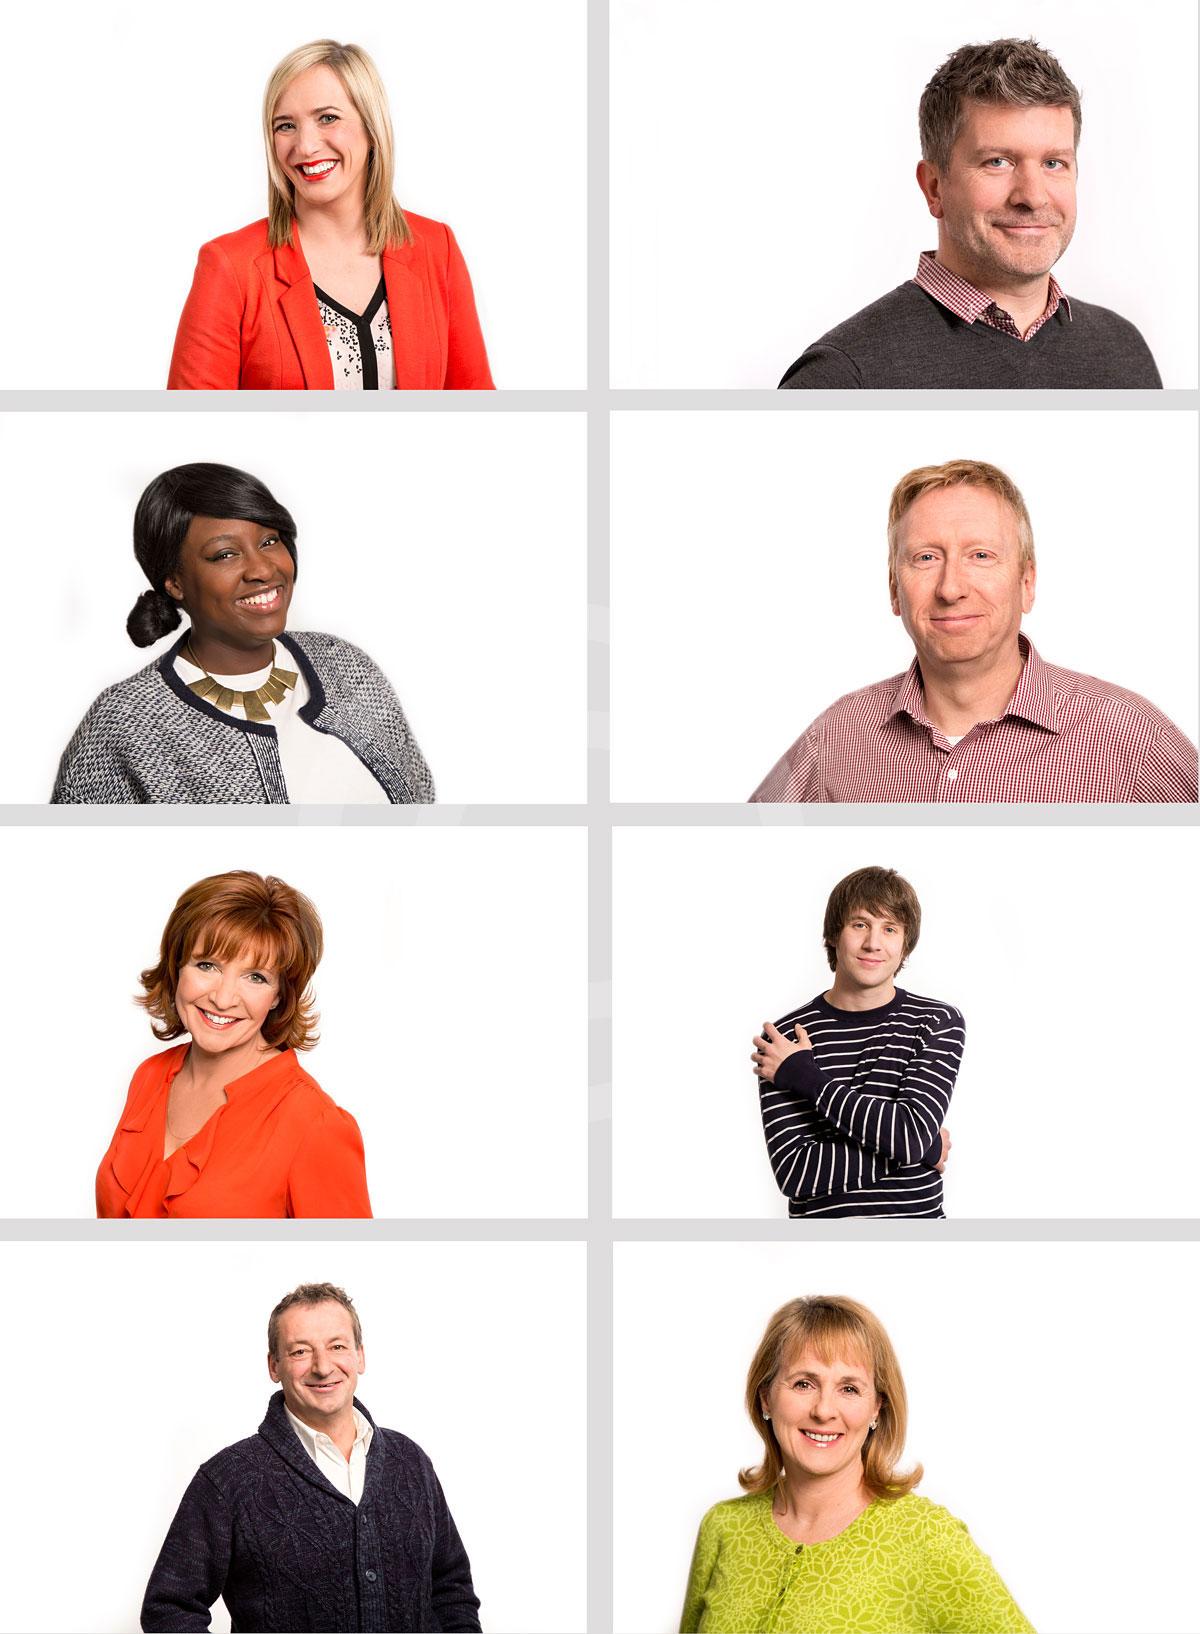 commercial-corporate-photography-york-bbc-portraits-presenters-headshots